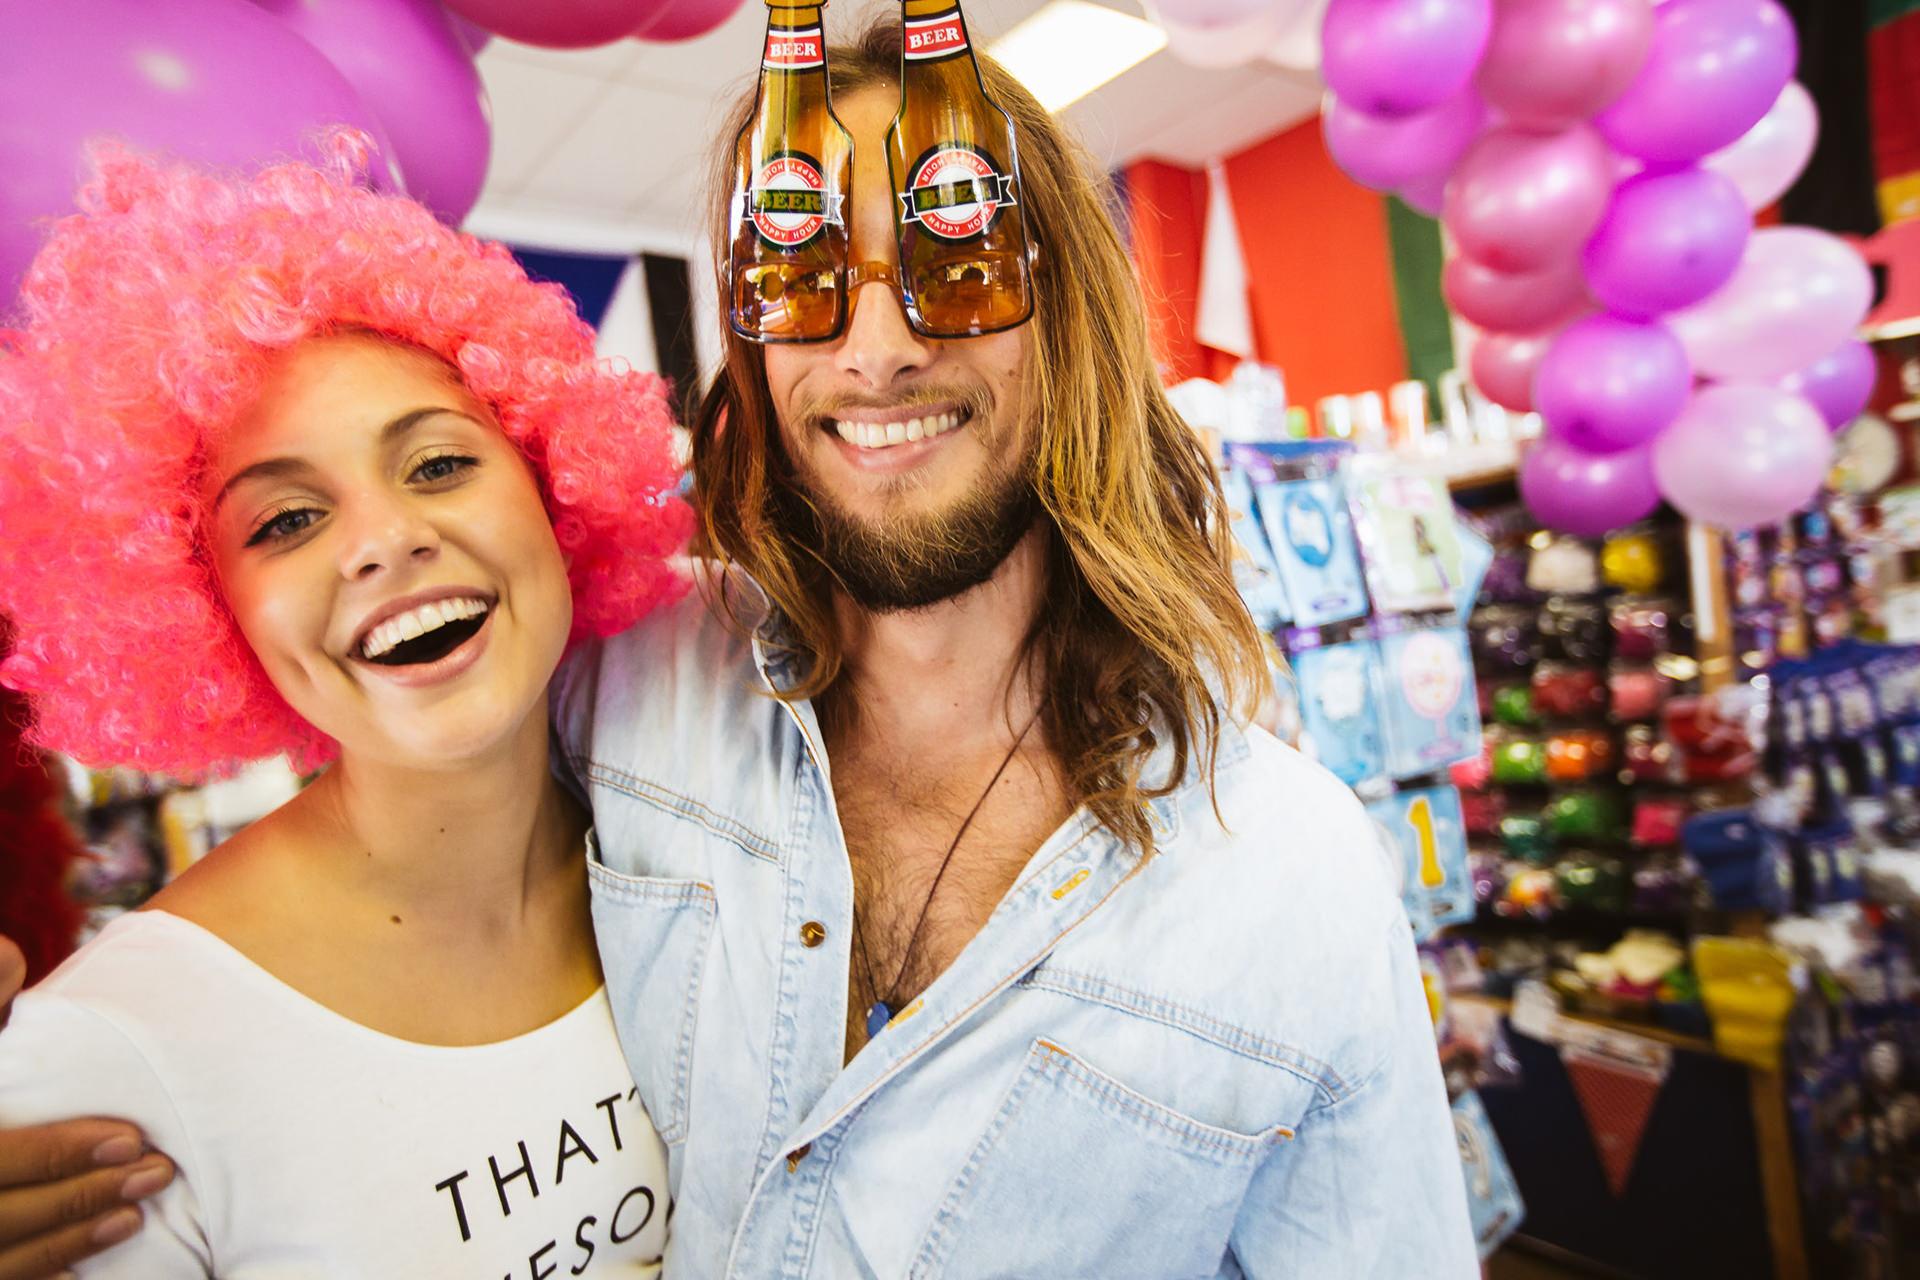 carneval-party-fun-couple-happy